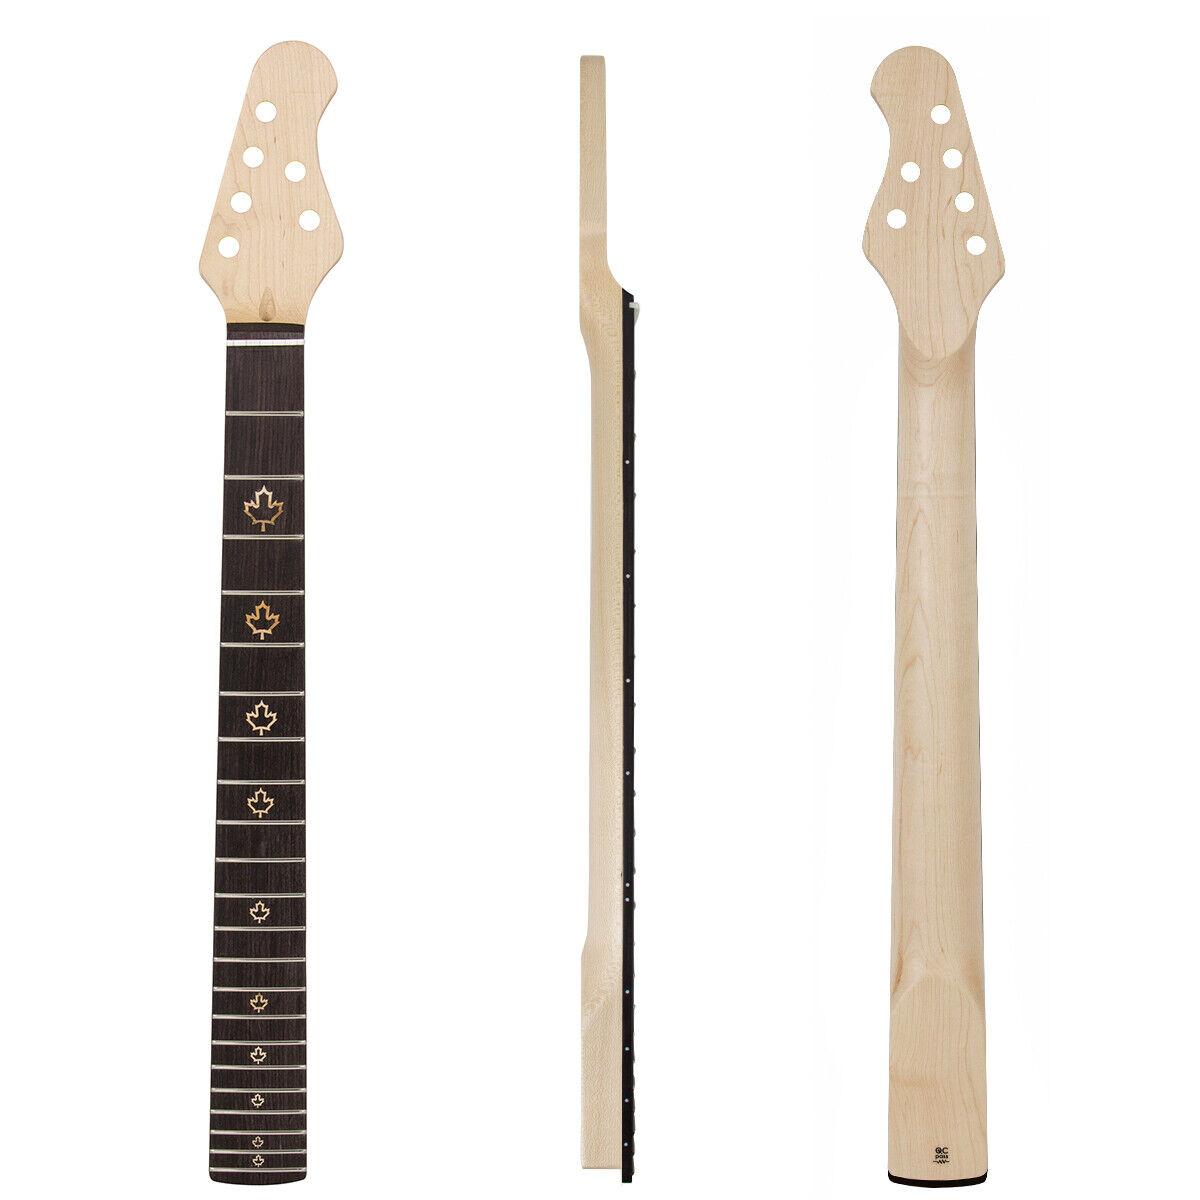 22 frets guitar neck for electric guitar parts replacement 4r2l bolt on maple ebay. Black Bedroom Furniture Sets. Home Design Ideas